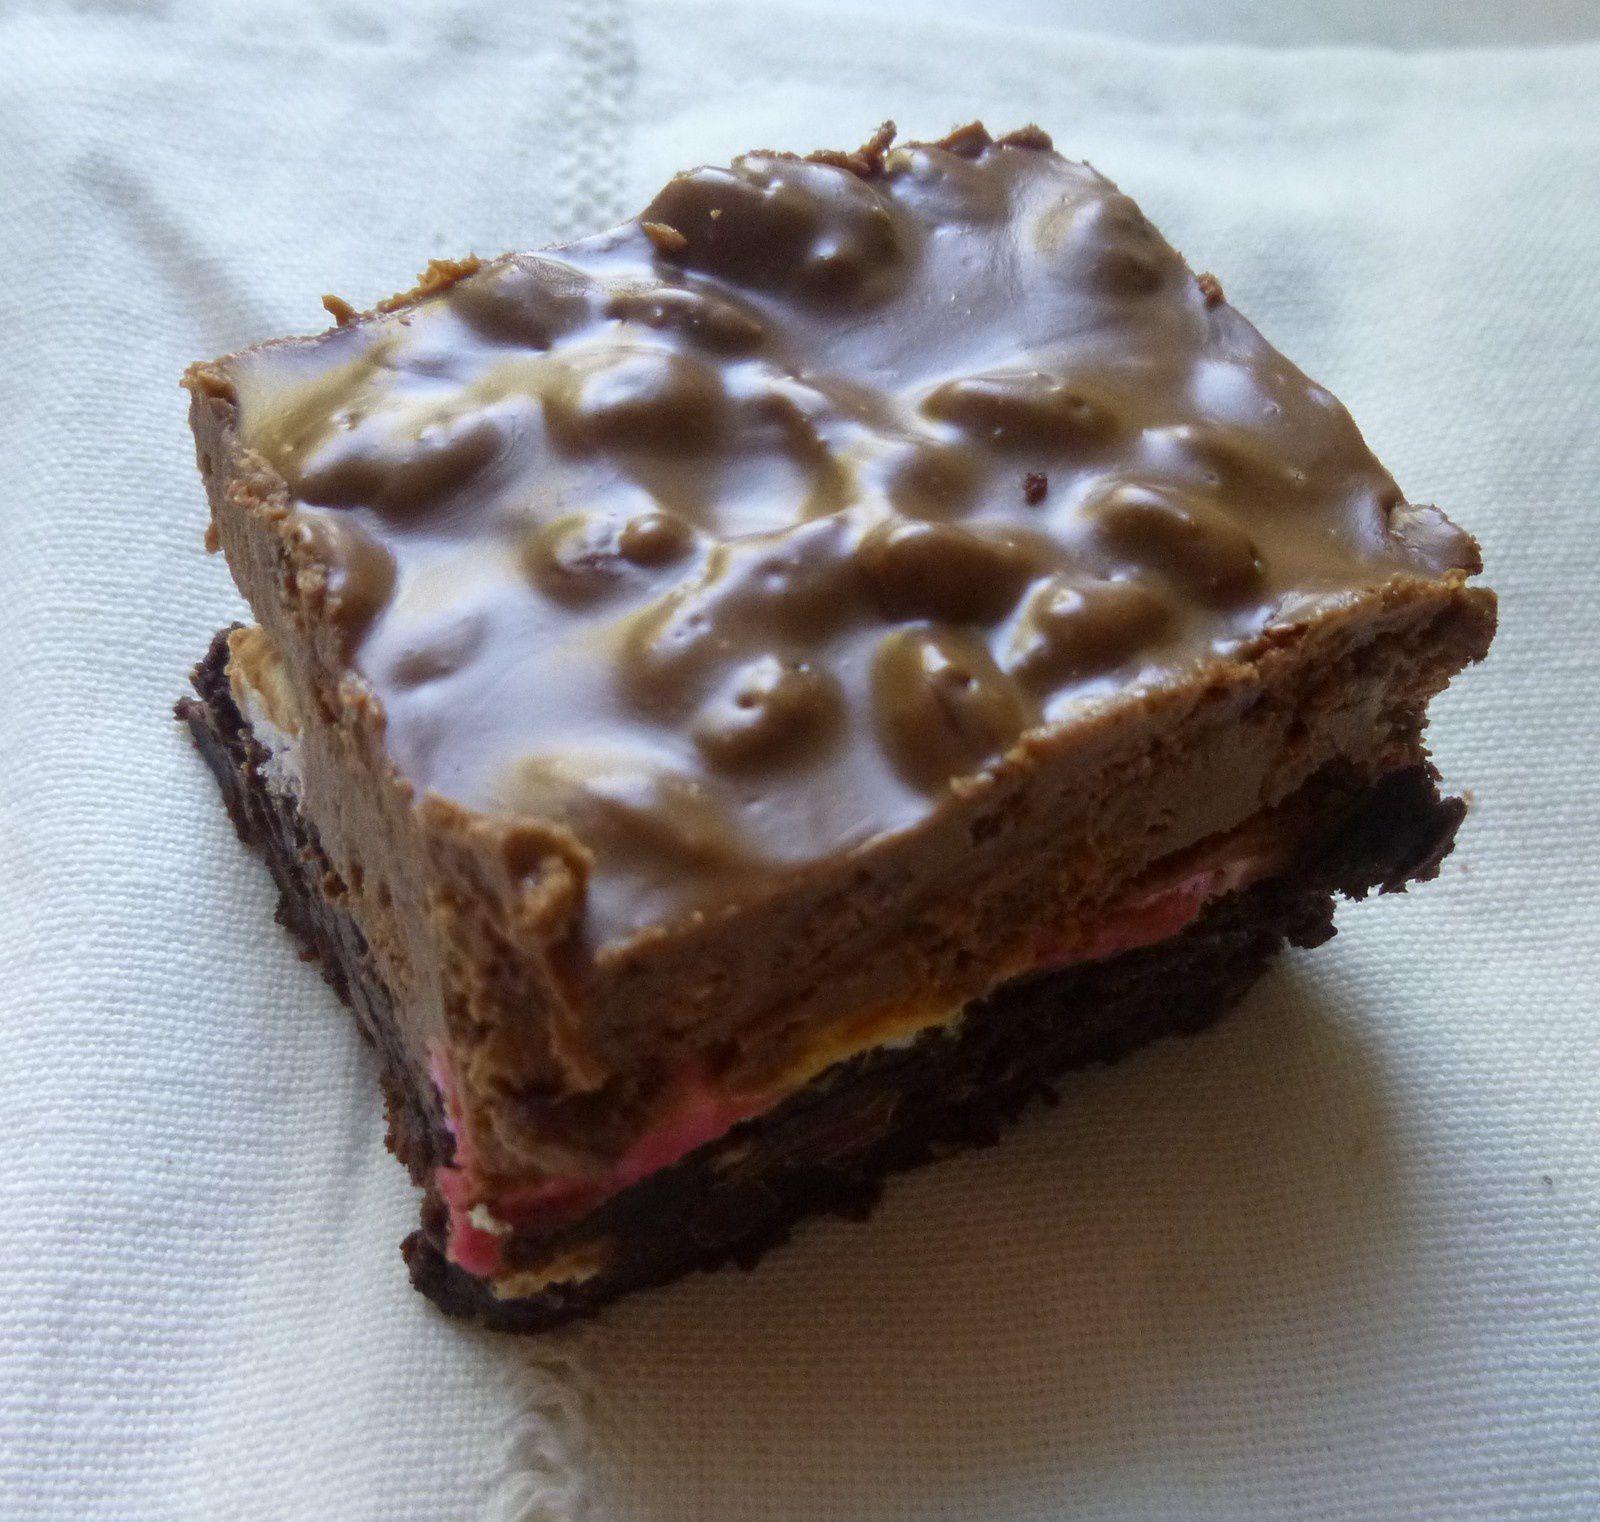 brownie totalement régressif